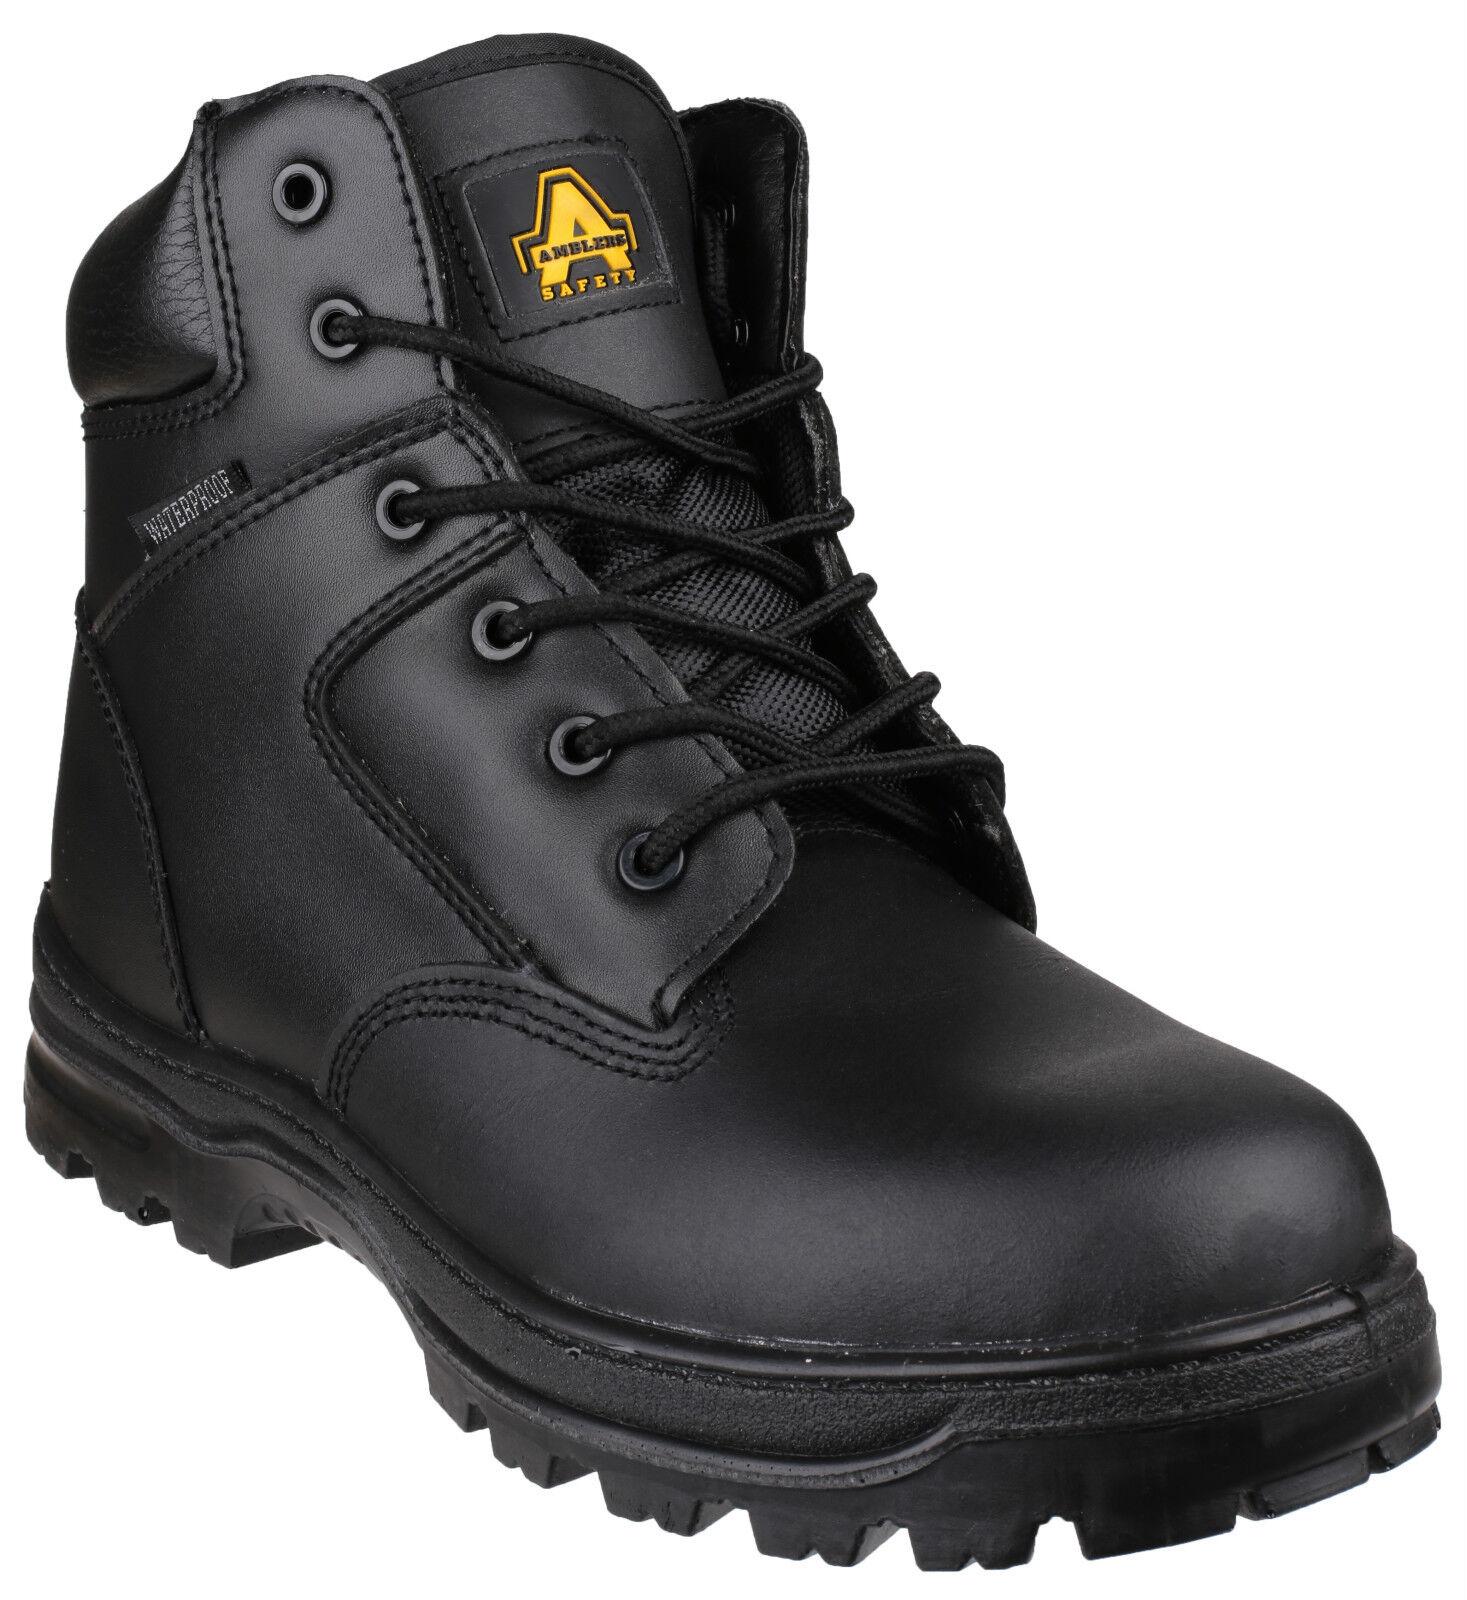 Amblers FS006C Waterproof Safety Mens Black Composite Toe Cap Boots shoes UK4-14